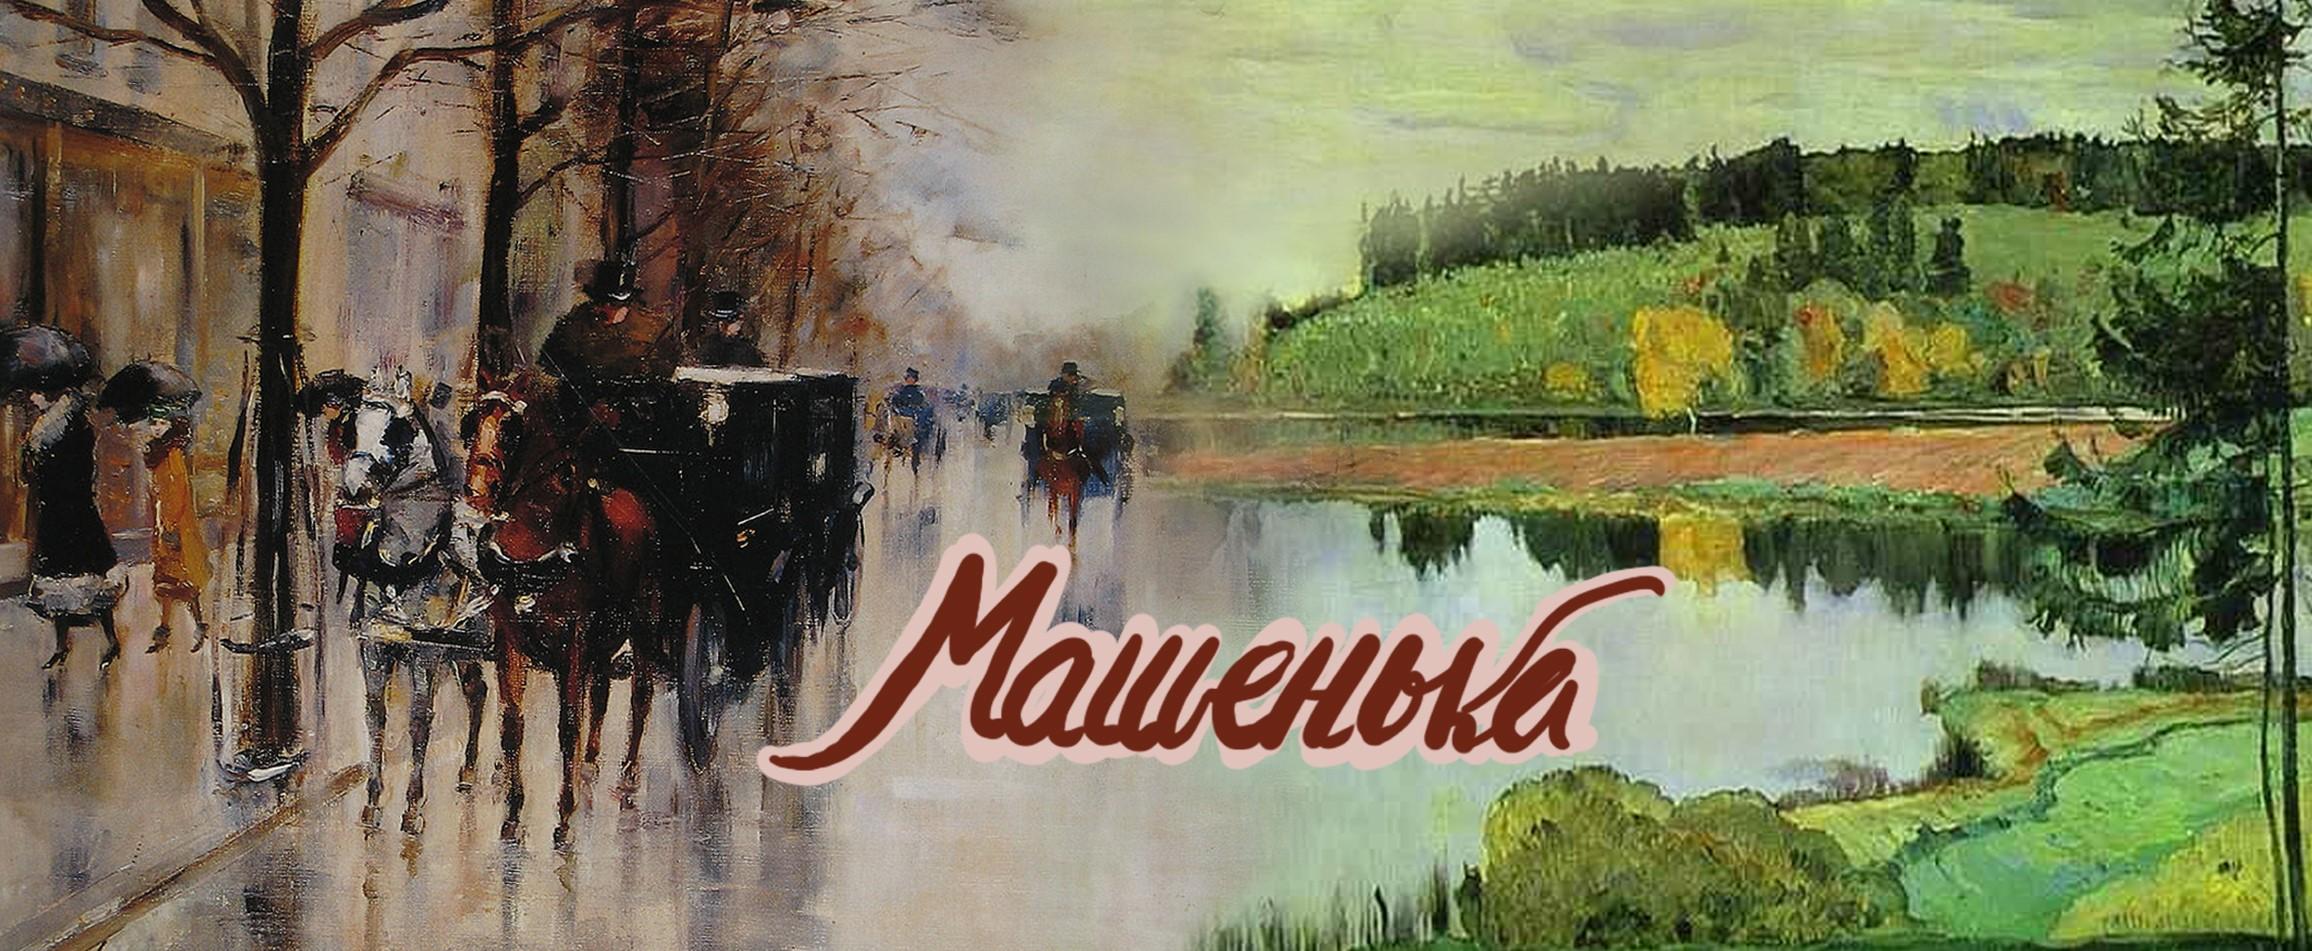 MASCHENKA Lesung frei nach Vladimir Nabokov